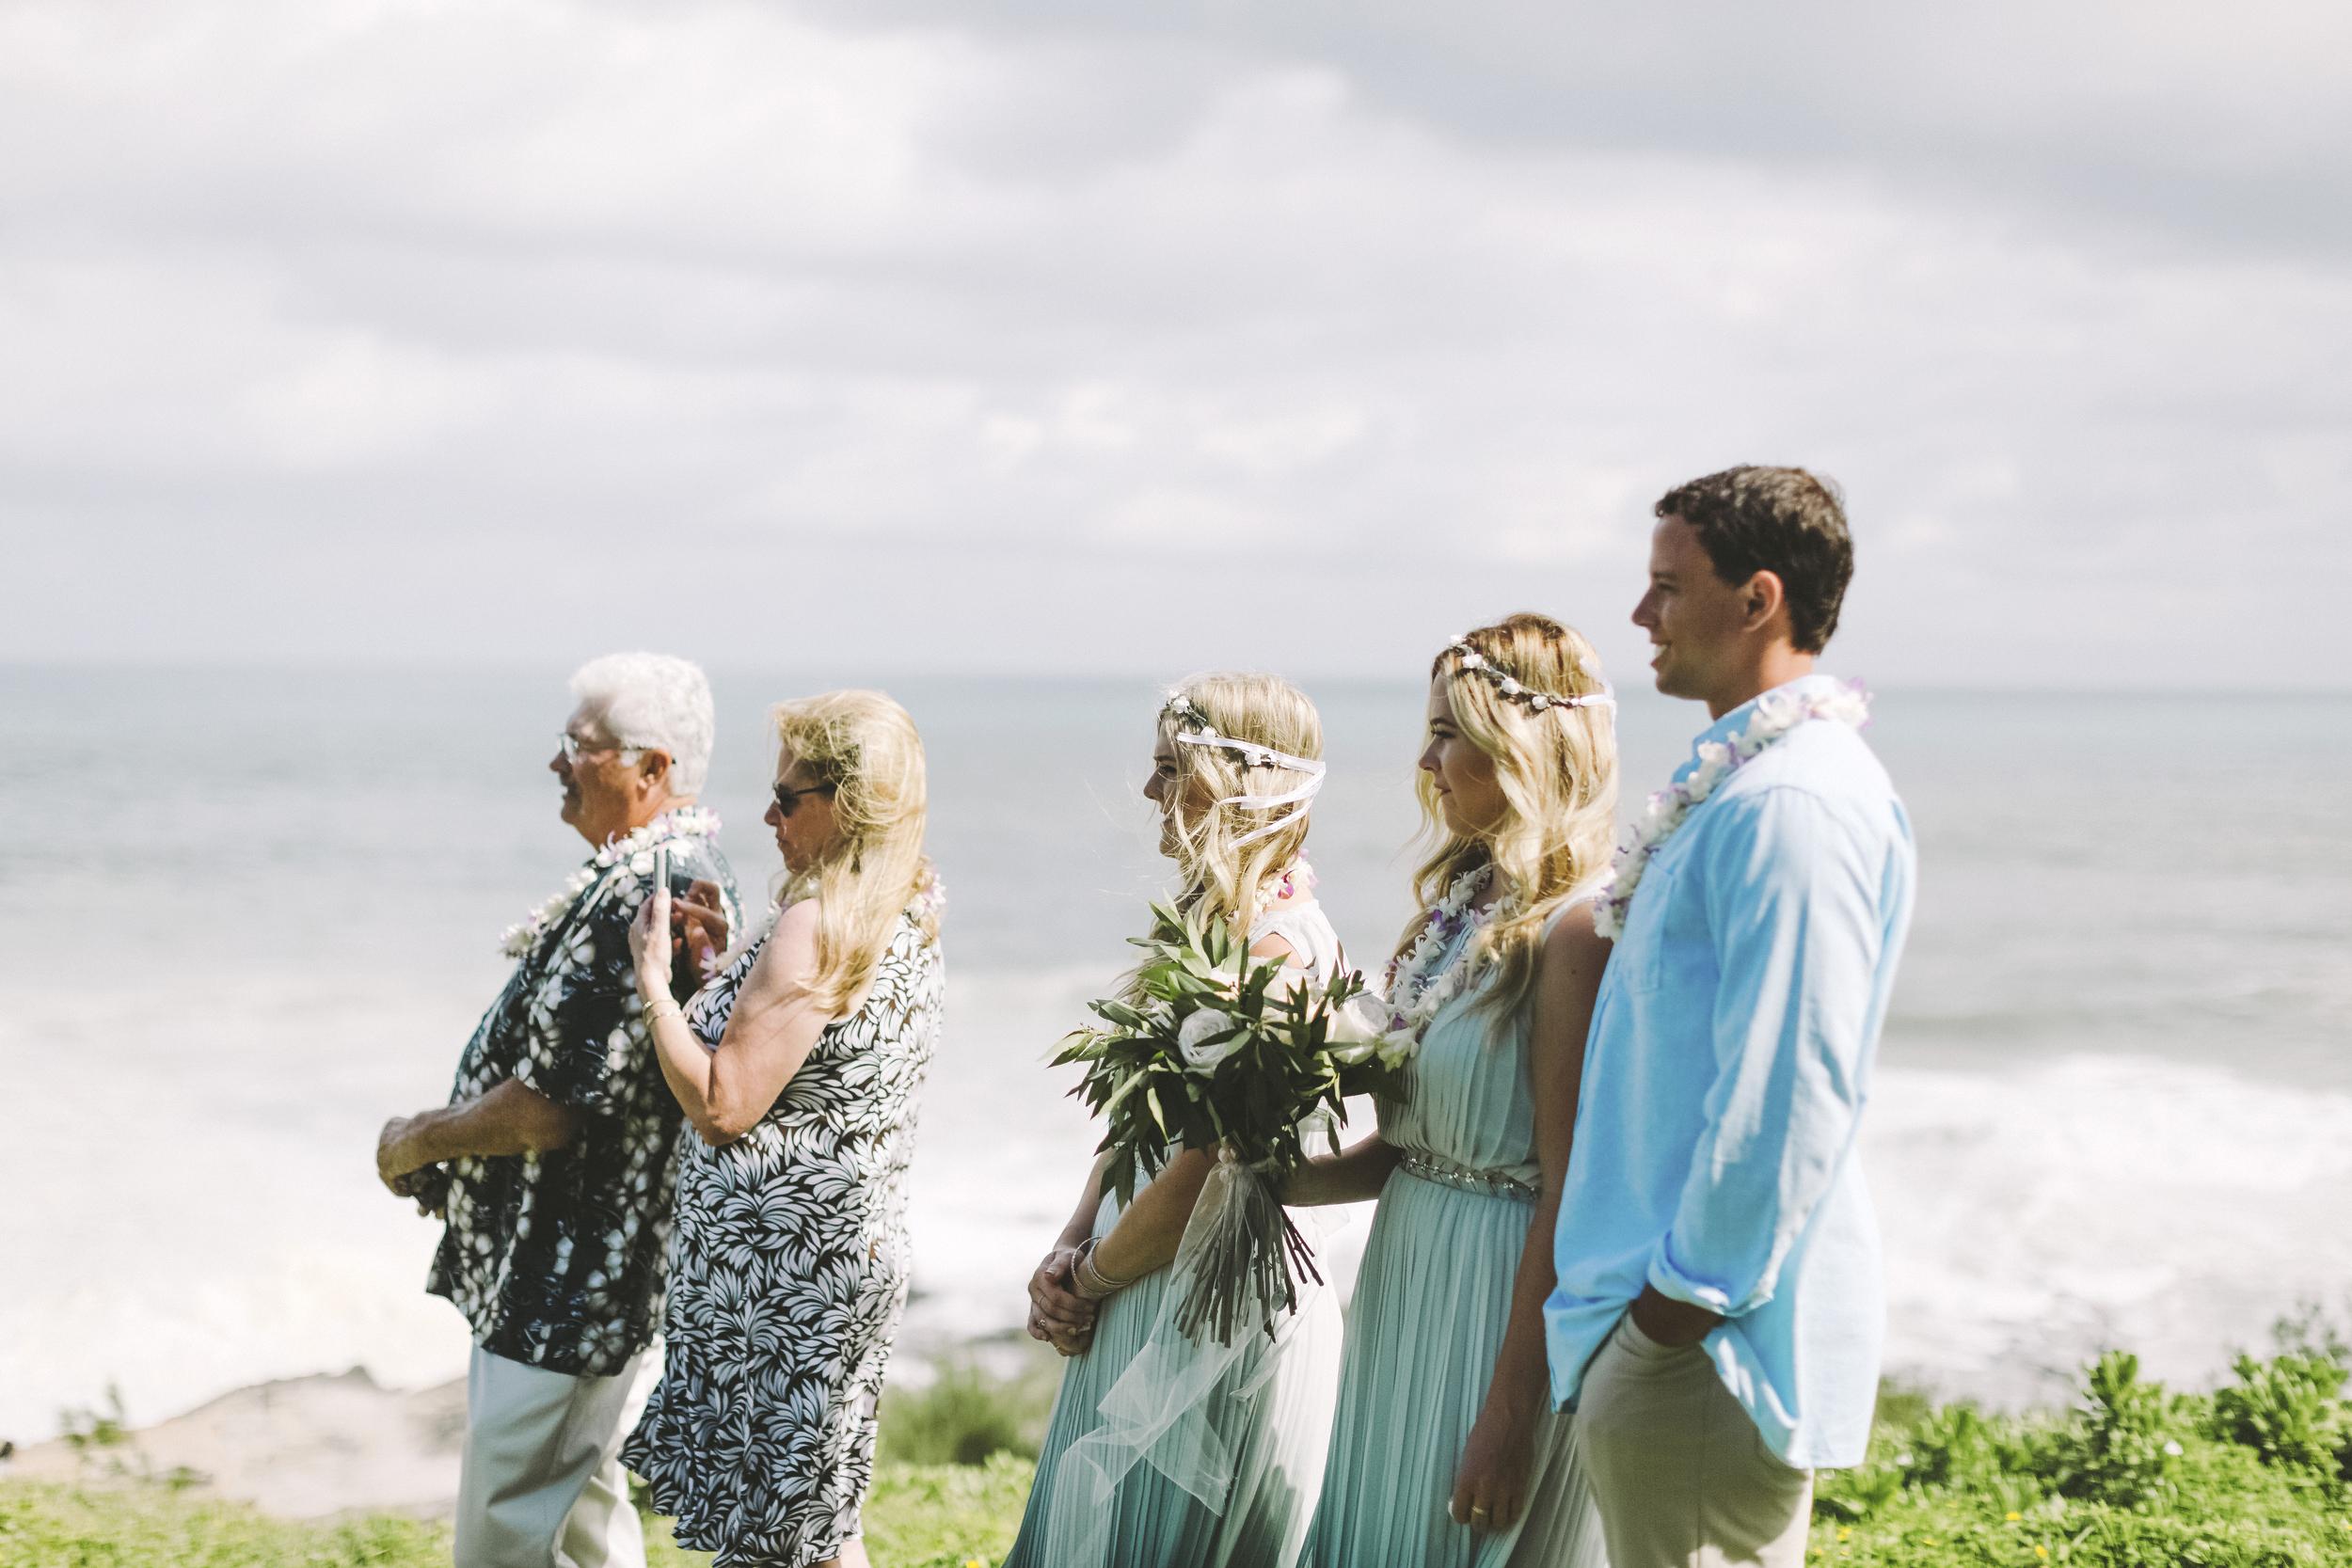 angie-diaz-photography-hawaii-wedding-19.jpg